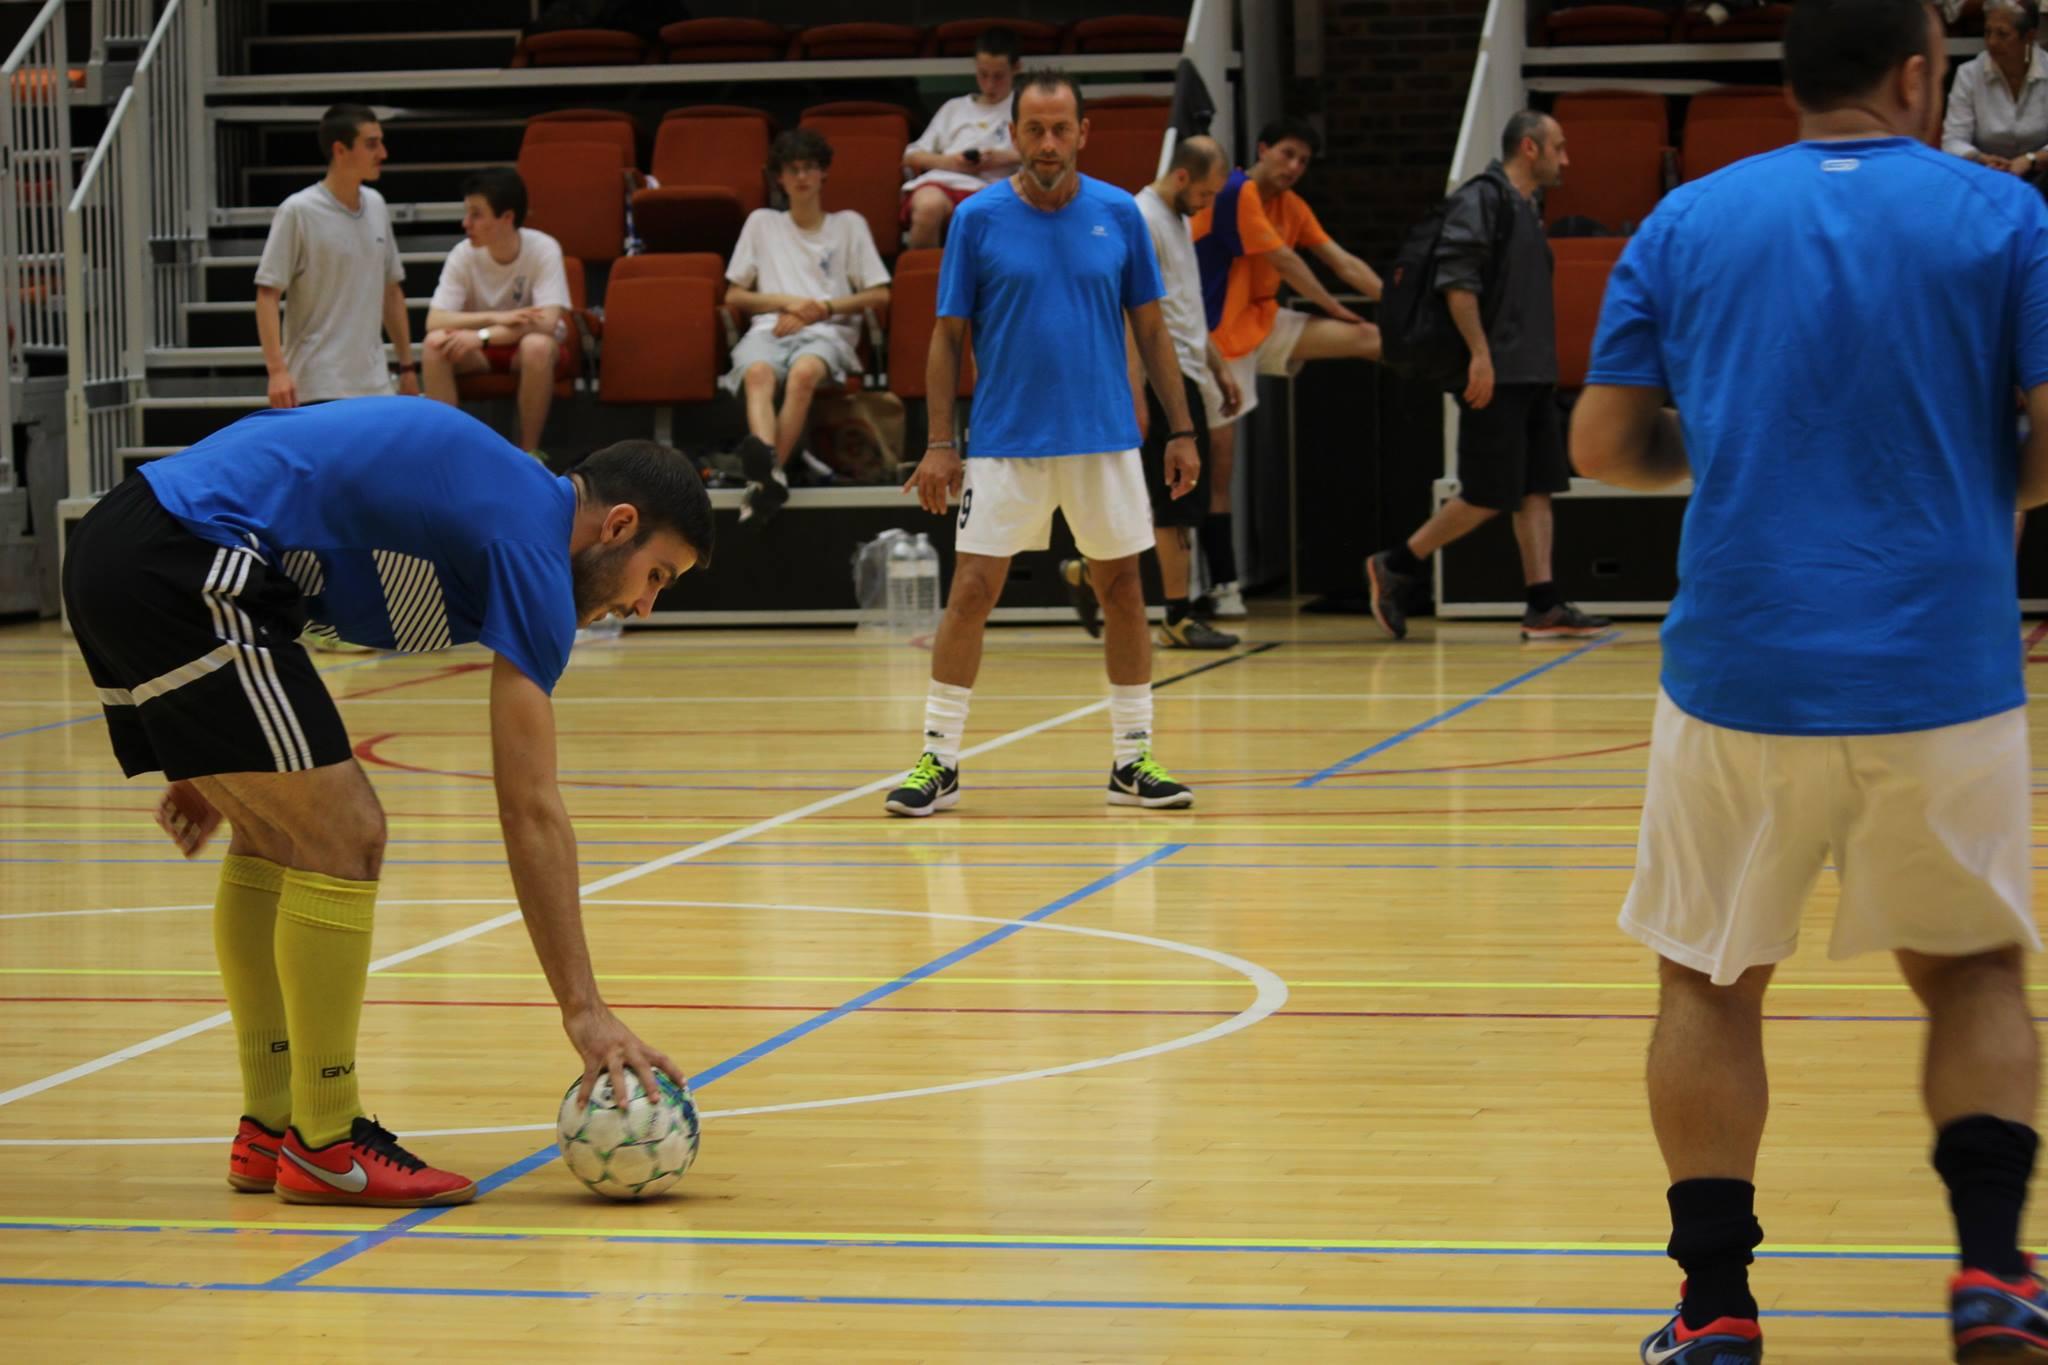 Squadra azzura en action